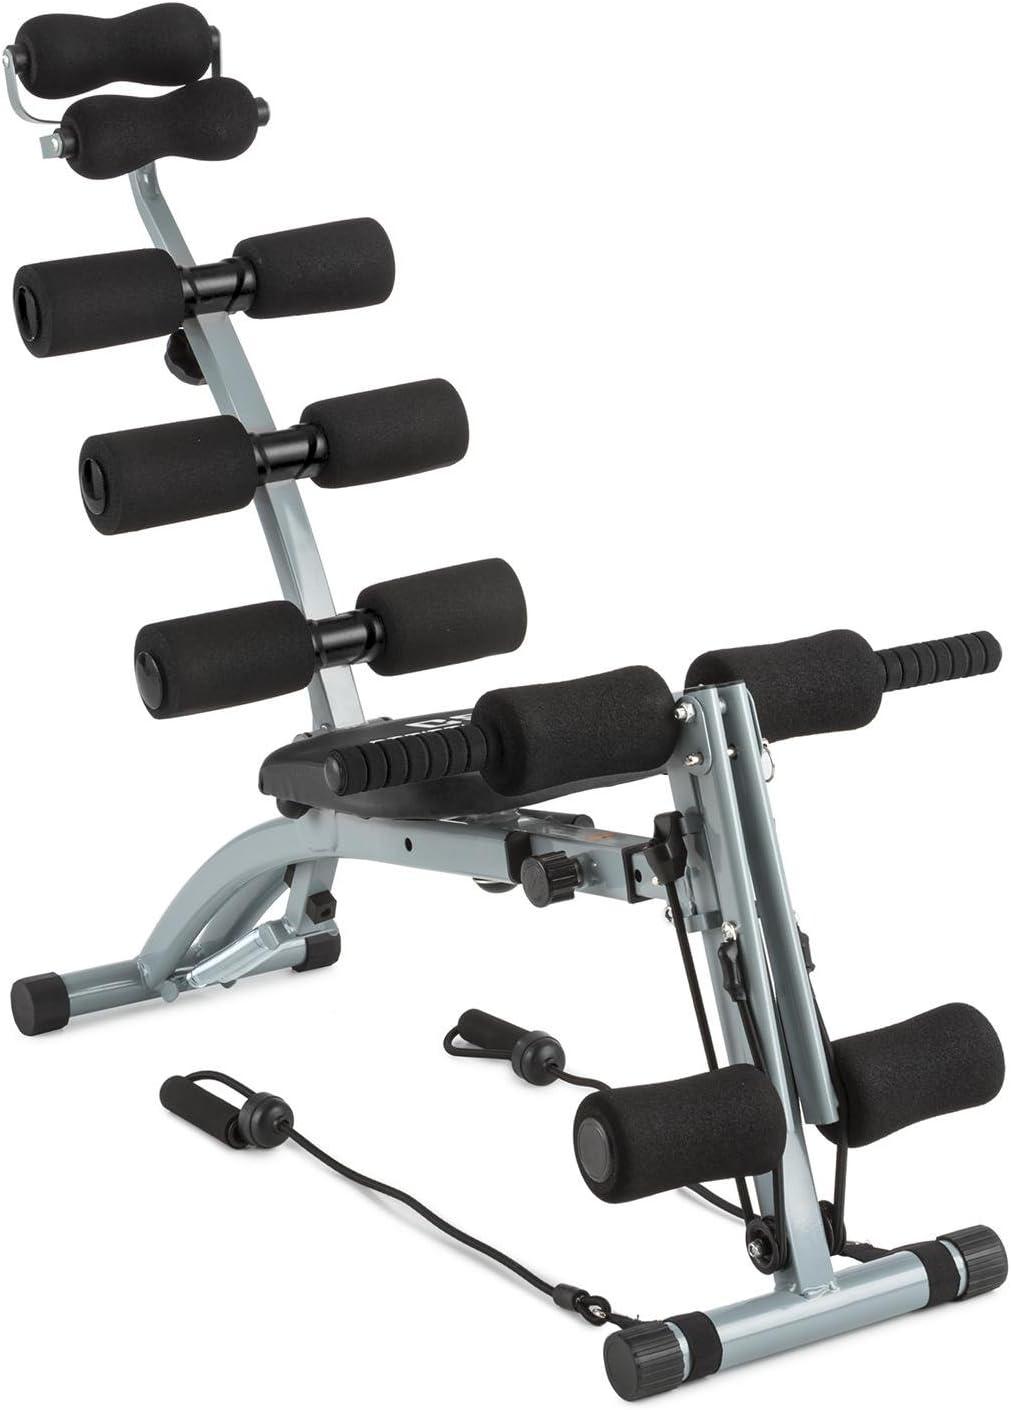 CapitalSports Capital Sports Sixish Core Maquina Multitrainer de Vientre con Multifunción